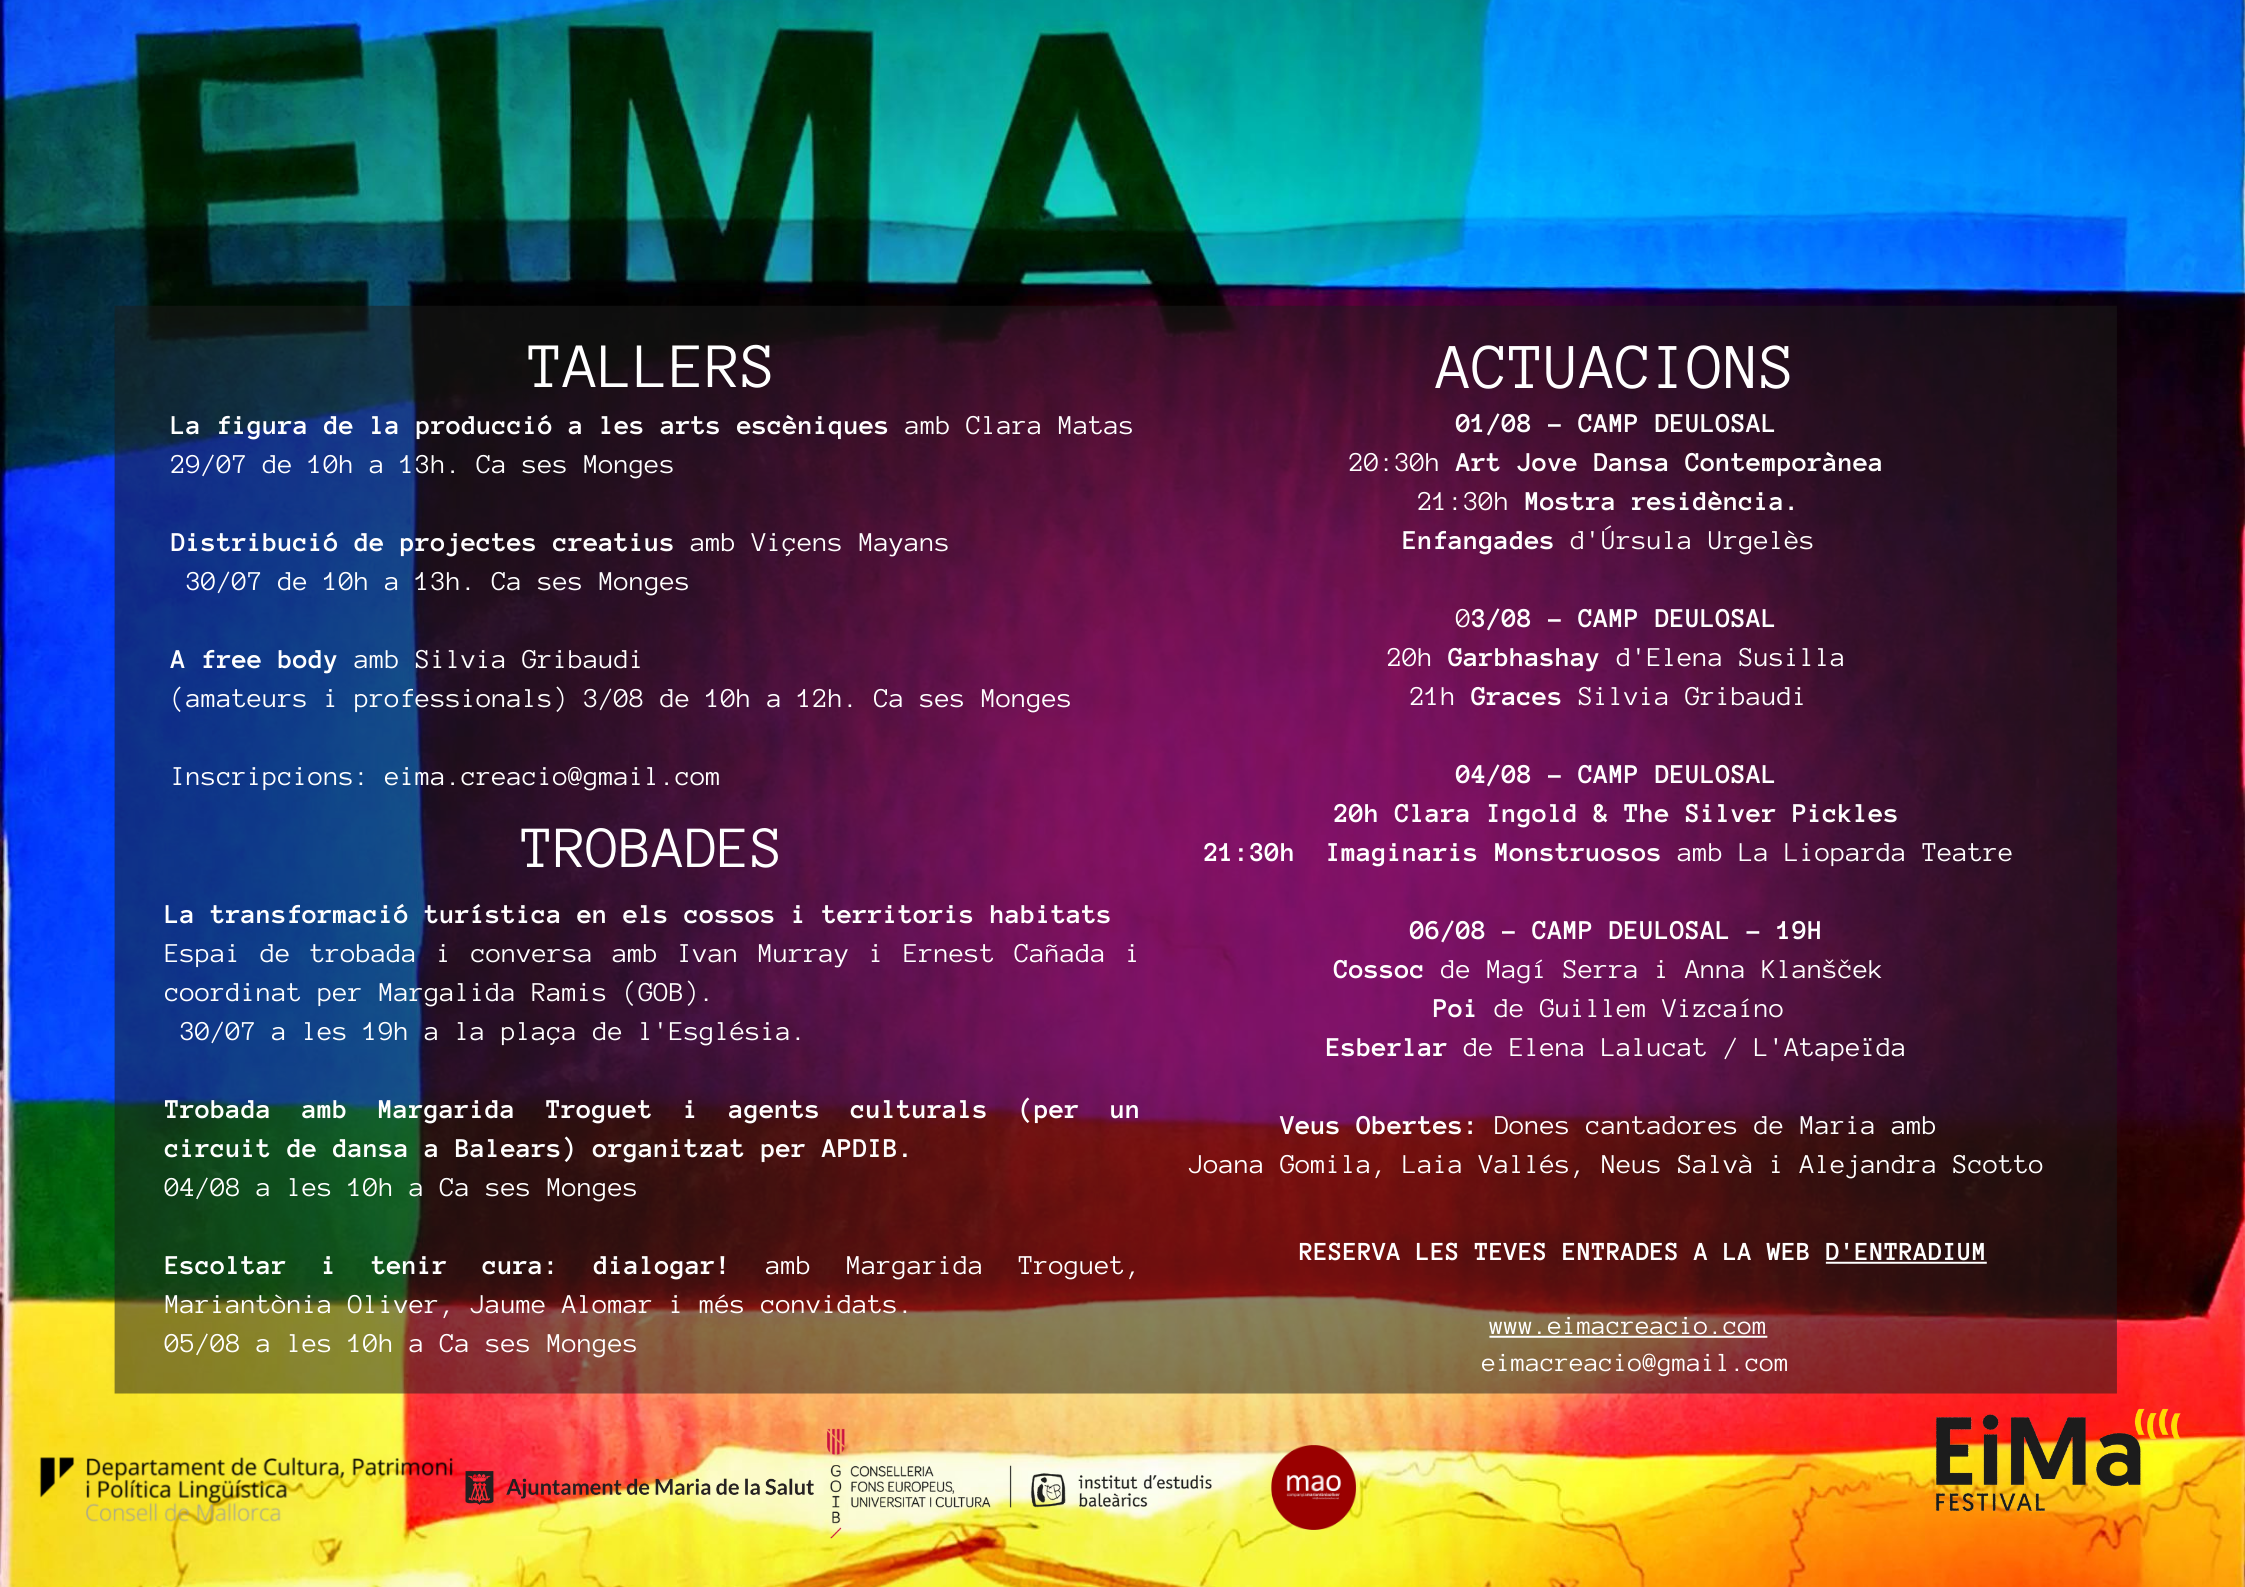 Eima Festival